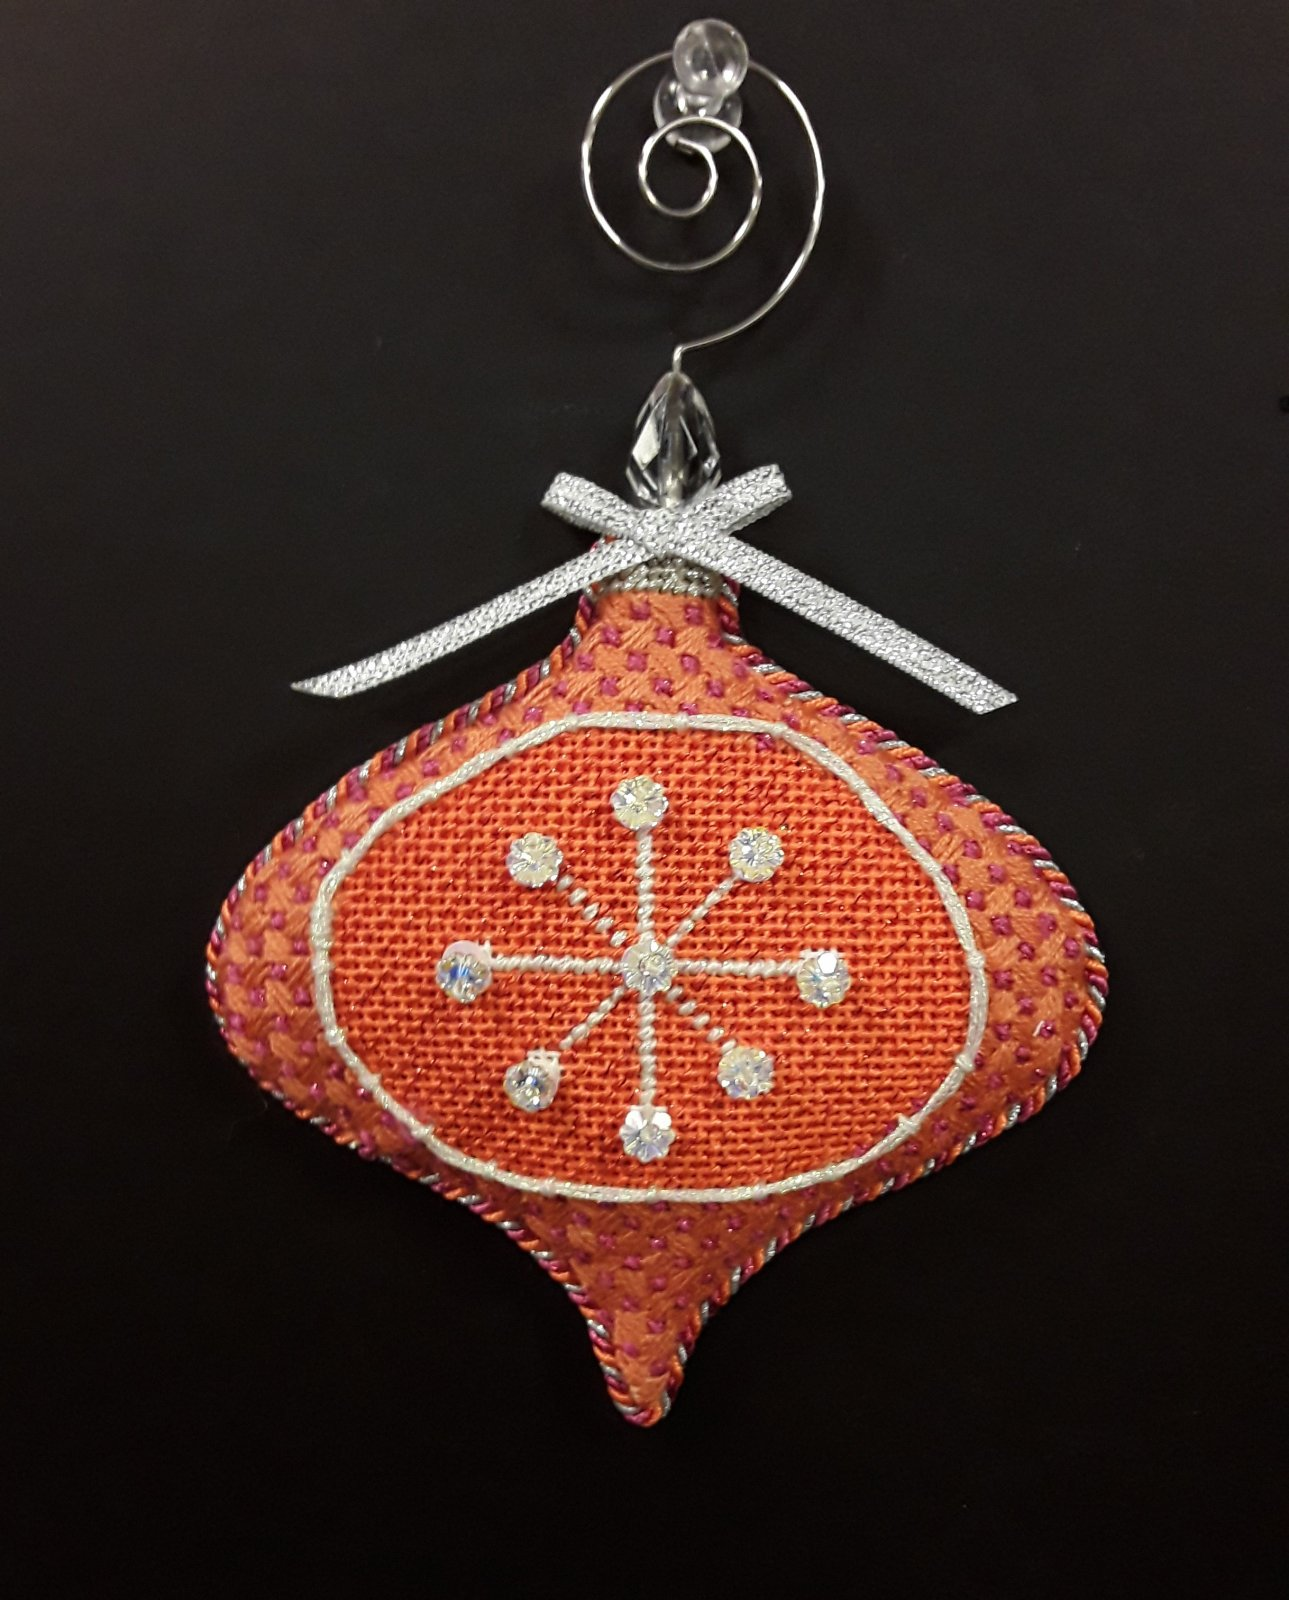 Atomic Bauble Orange - Stitched By Cynthia B.